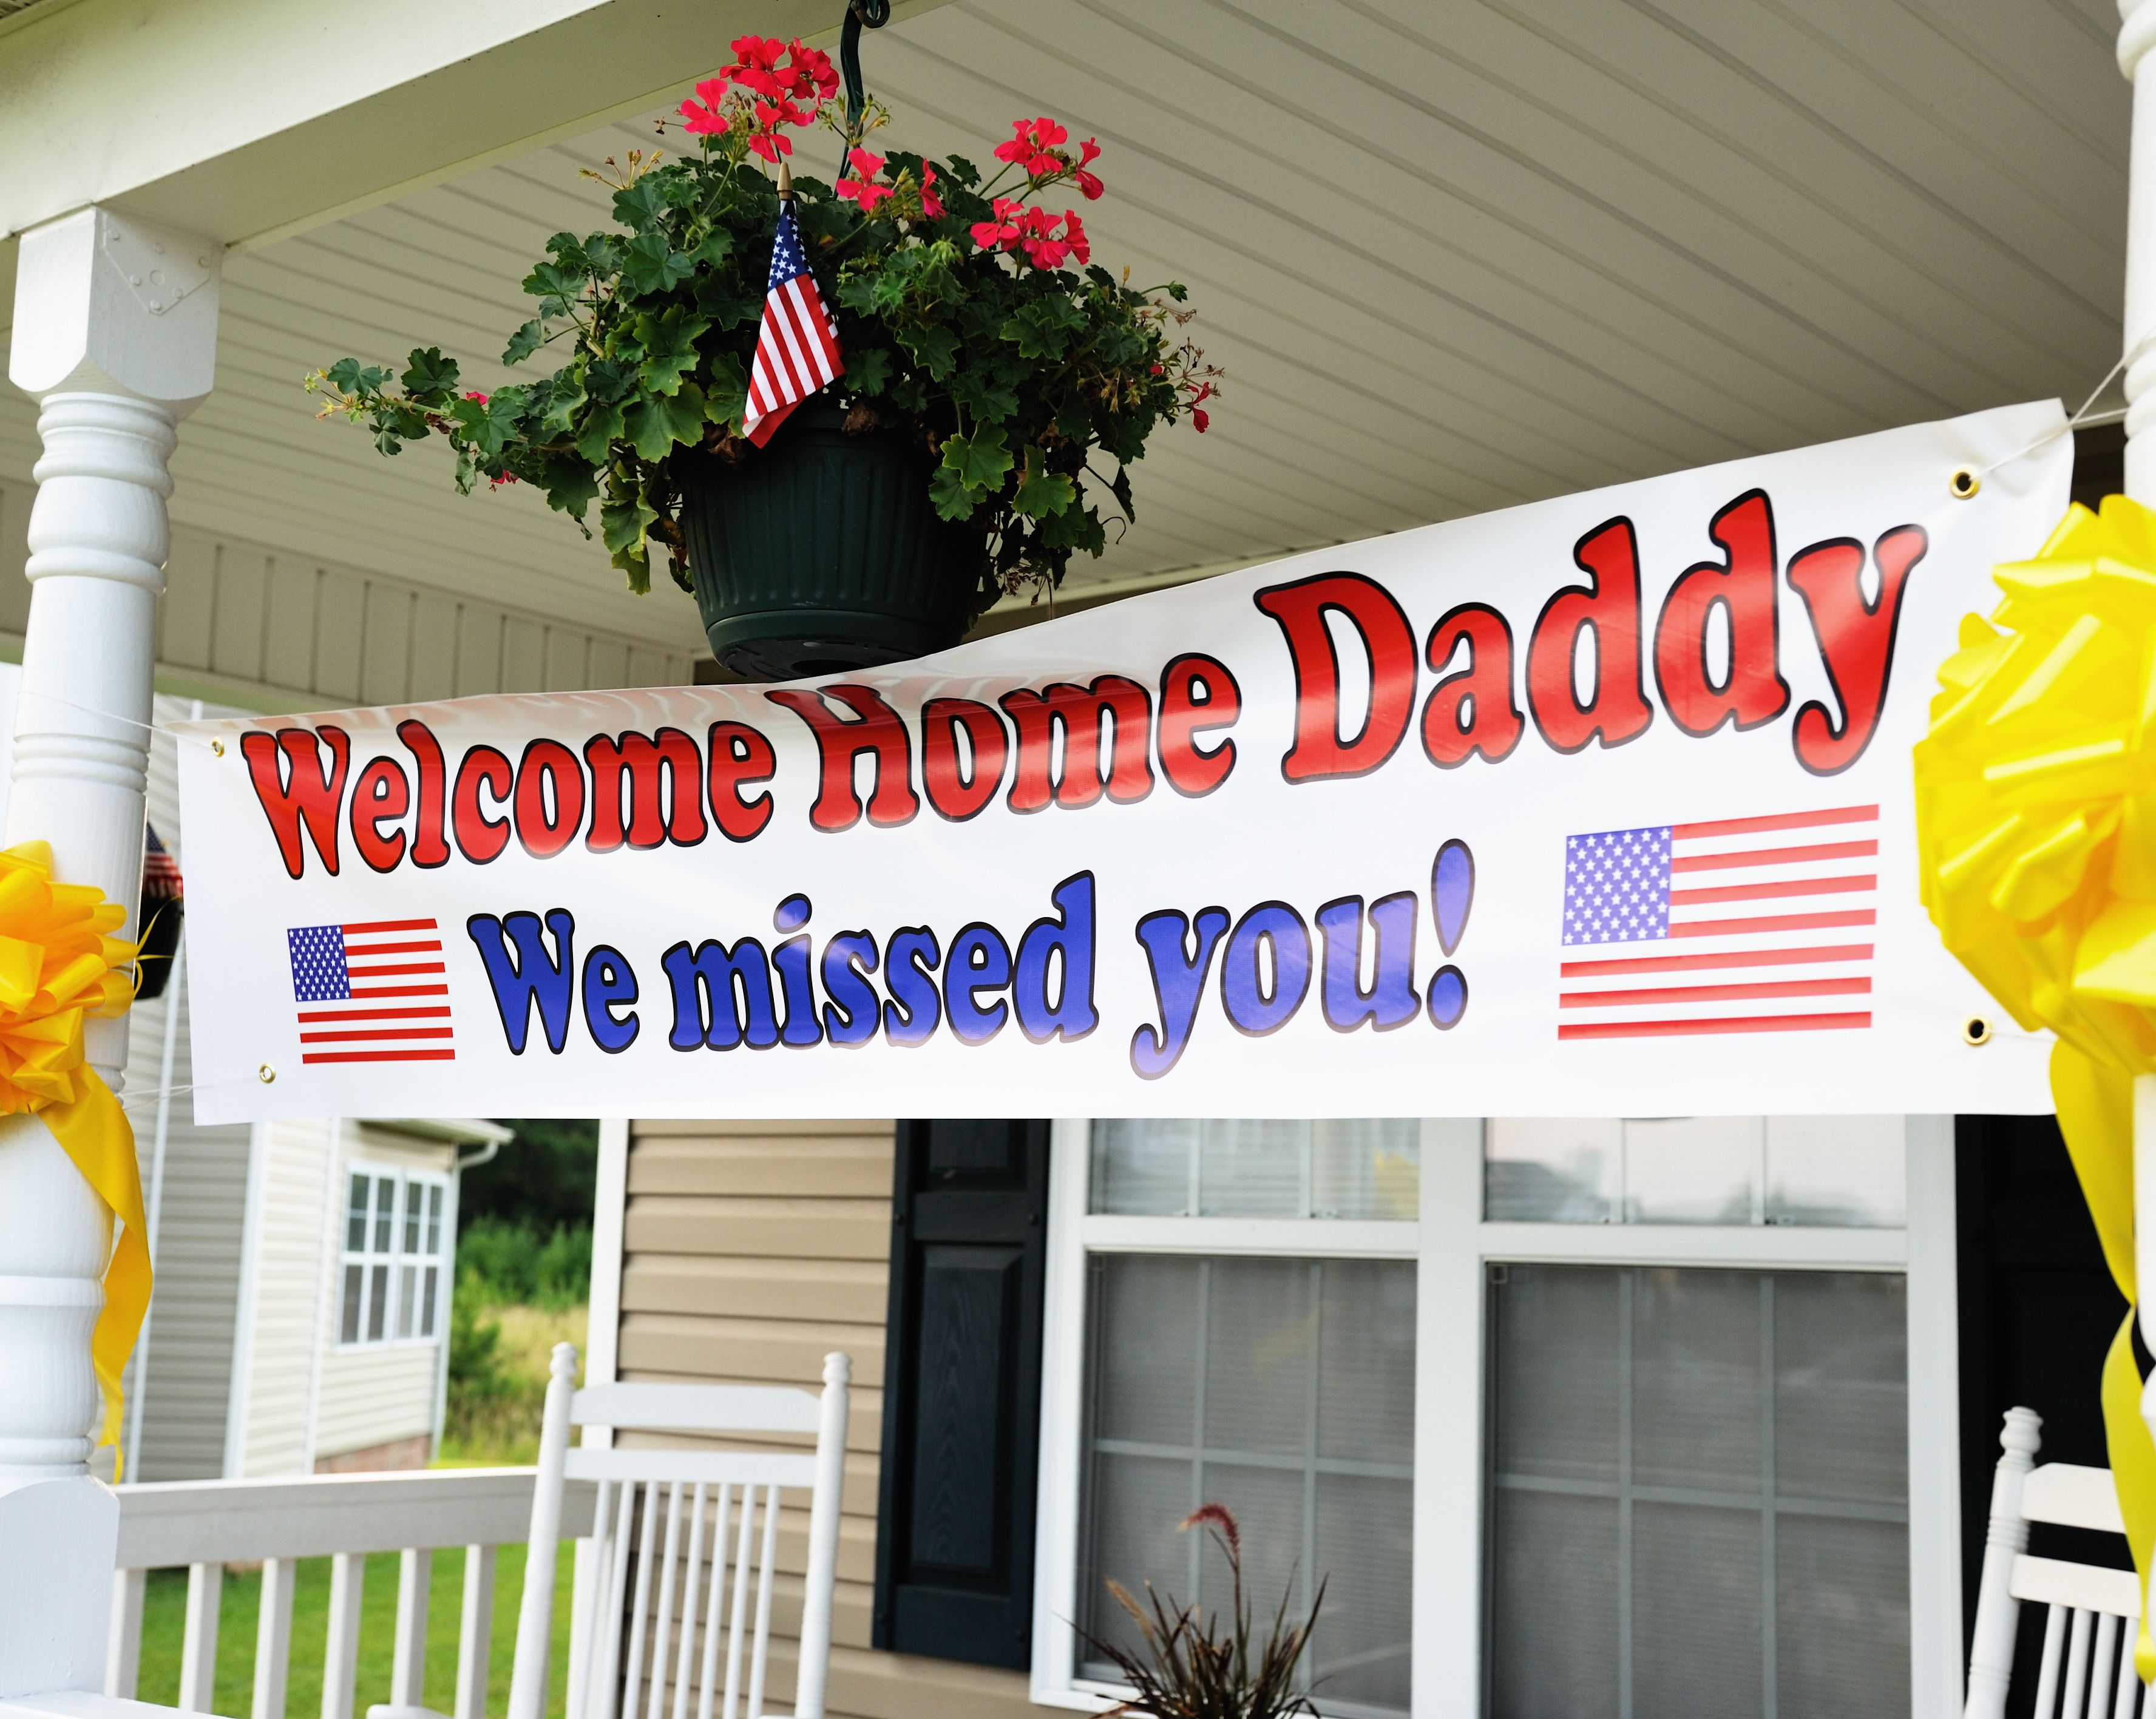 14 Freebies for Military Members and Veterans